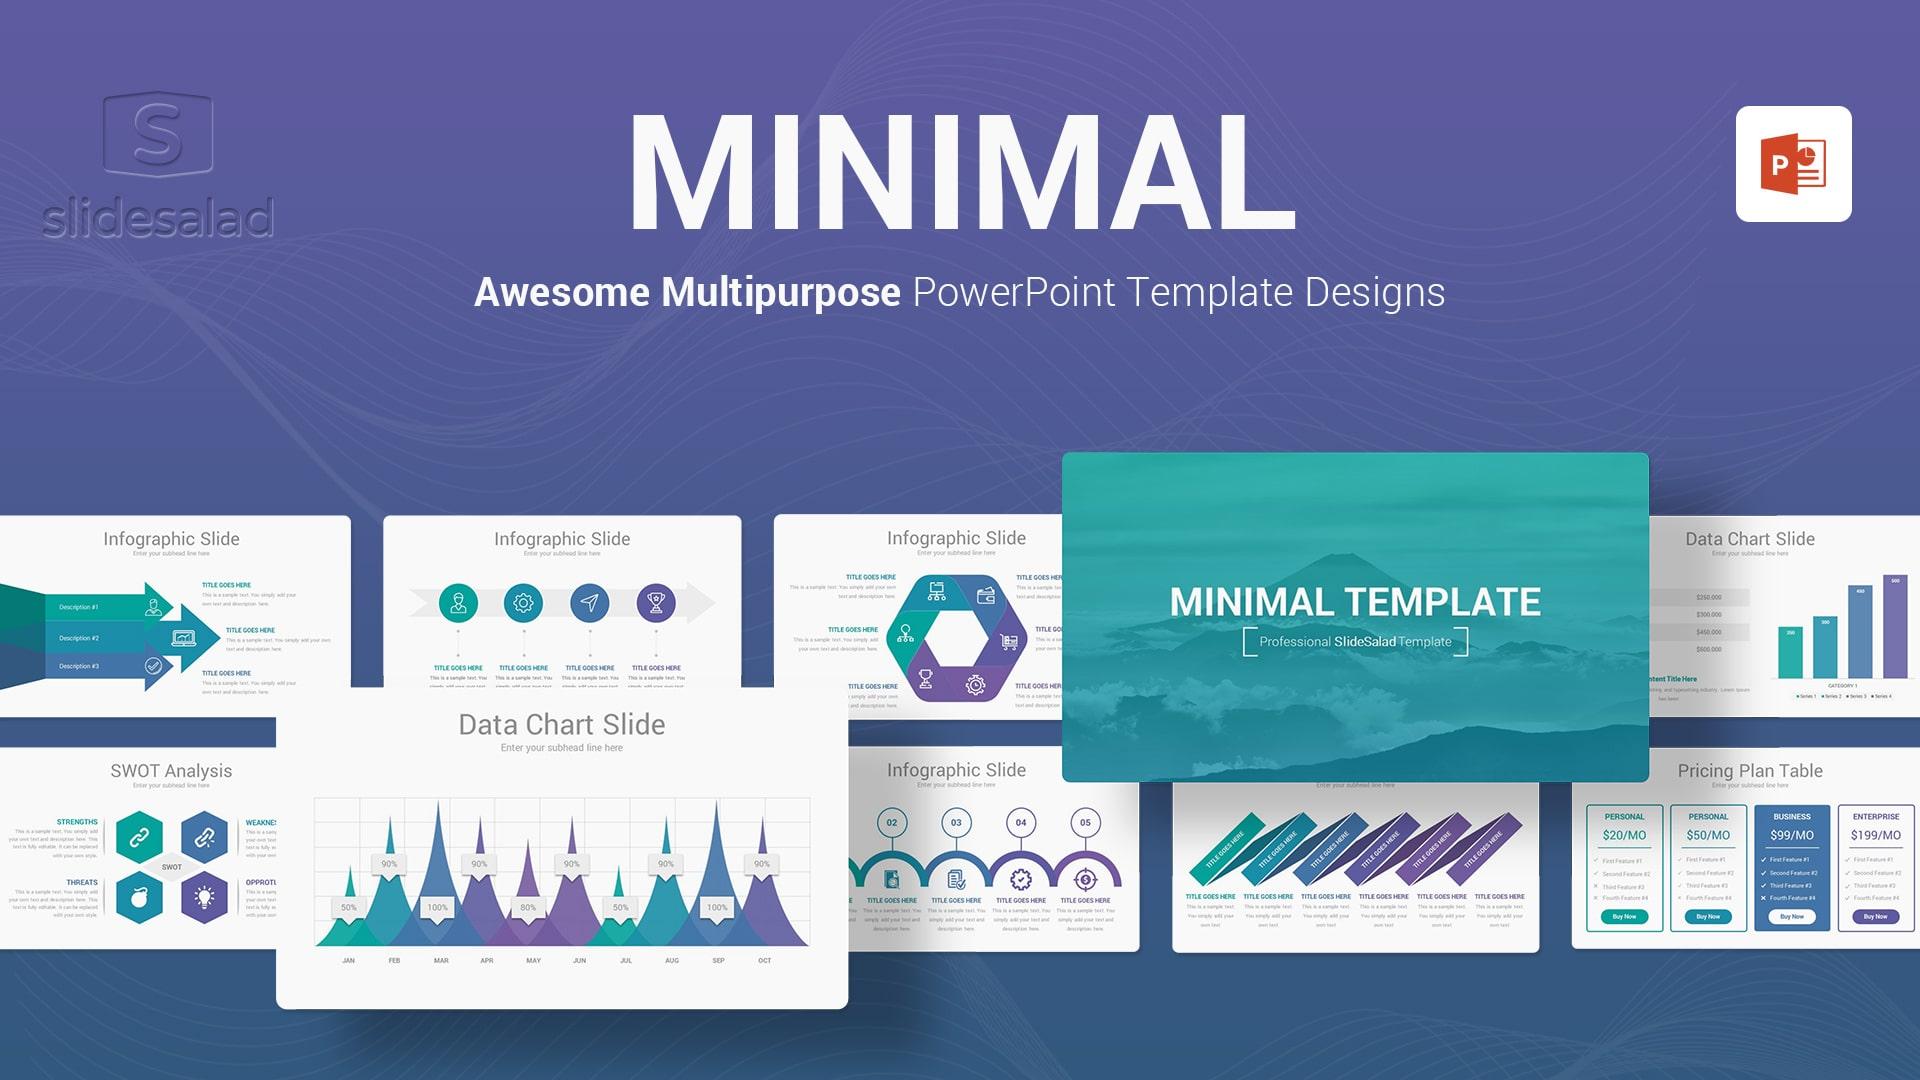 Minimal PowerPoint Presentation Template Design - Fully Customizable Formal PowerPoint Templates